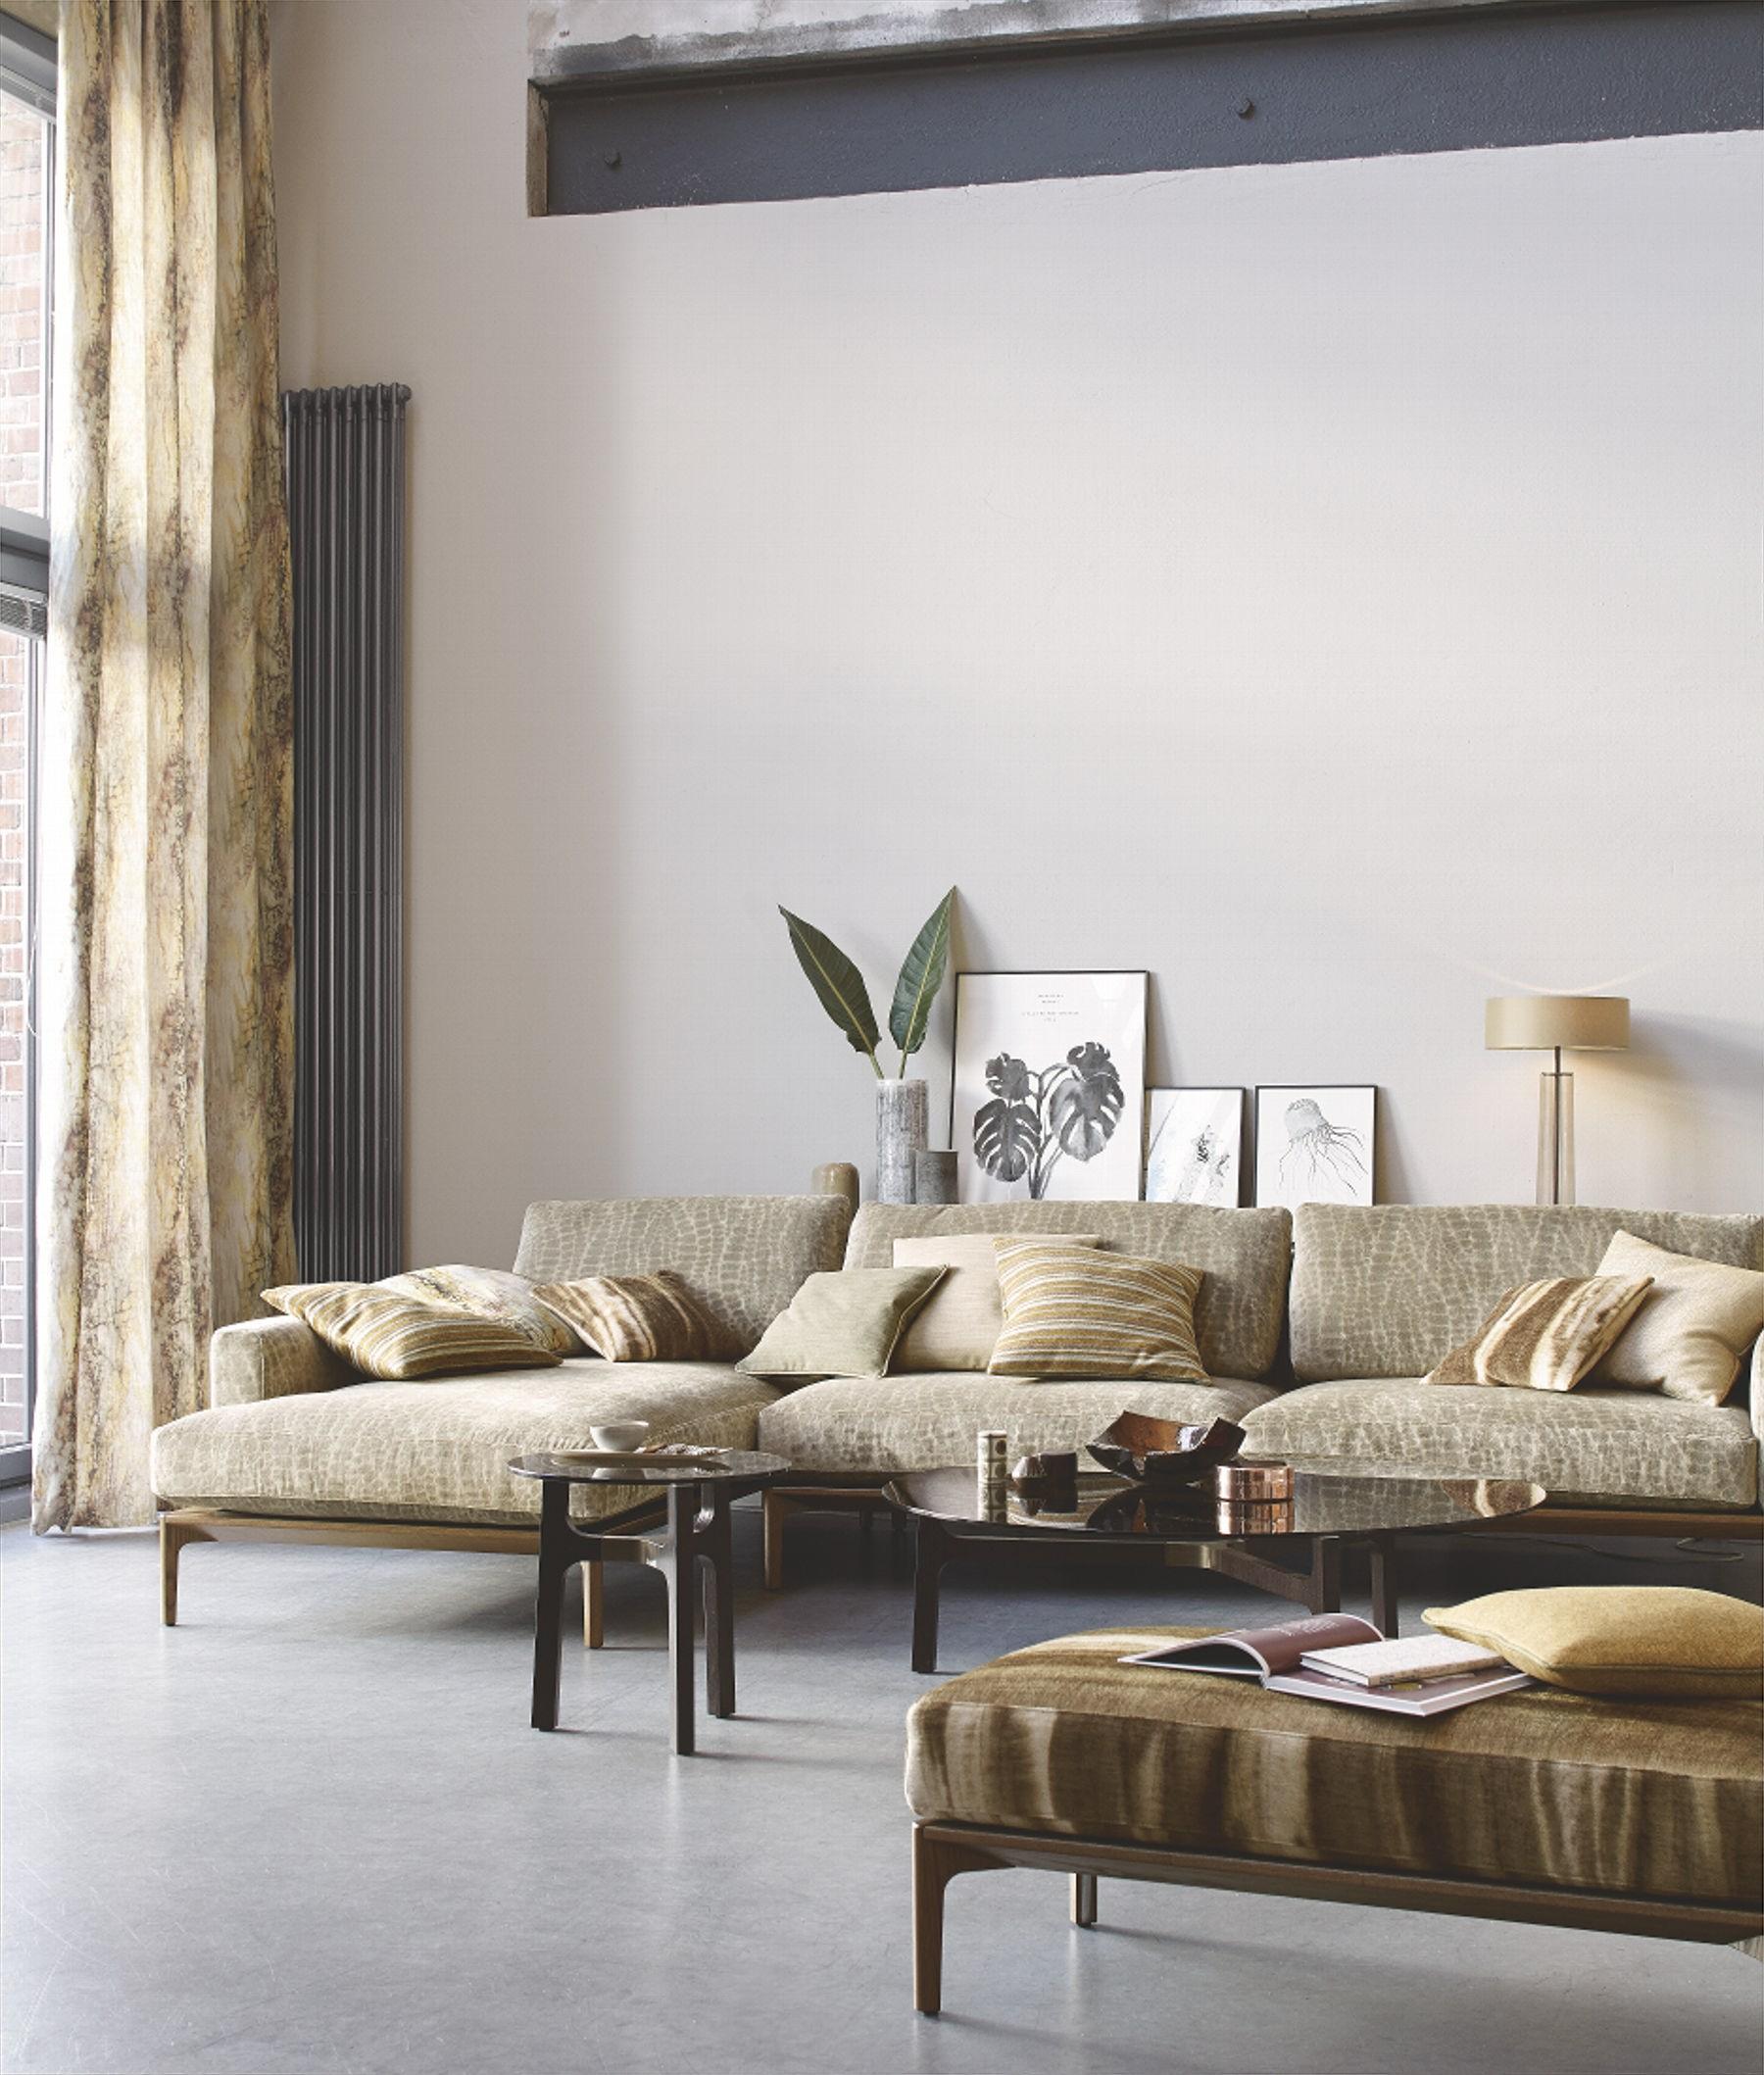 upholstery fabric groovy linen 1 5047 040 jab anstoetz. Black Bedroom Furniture Sets. Home Design Ideas